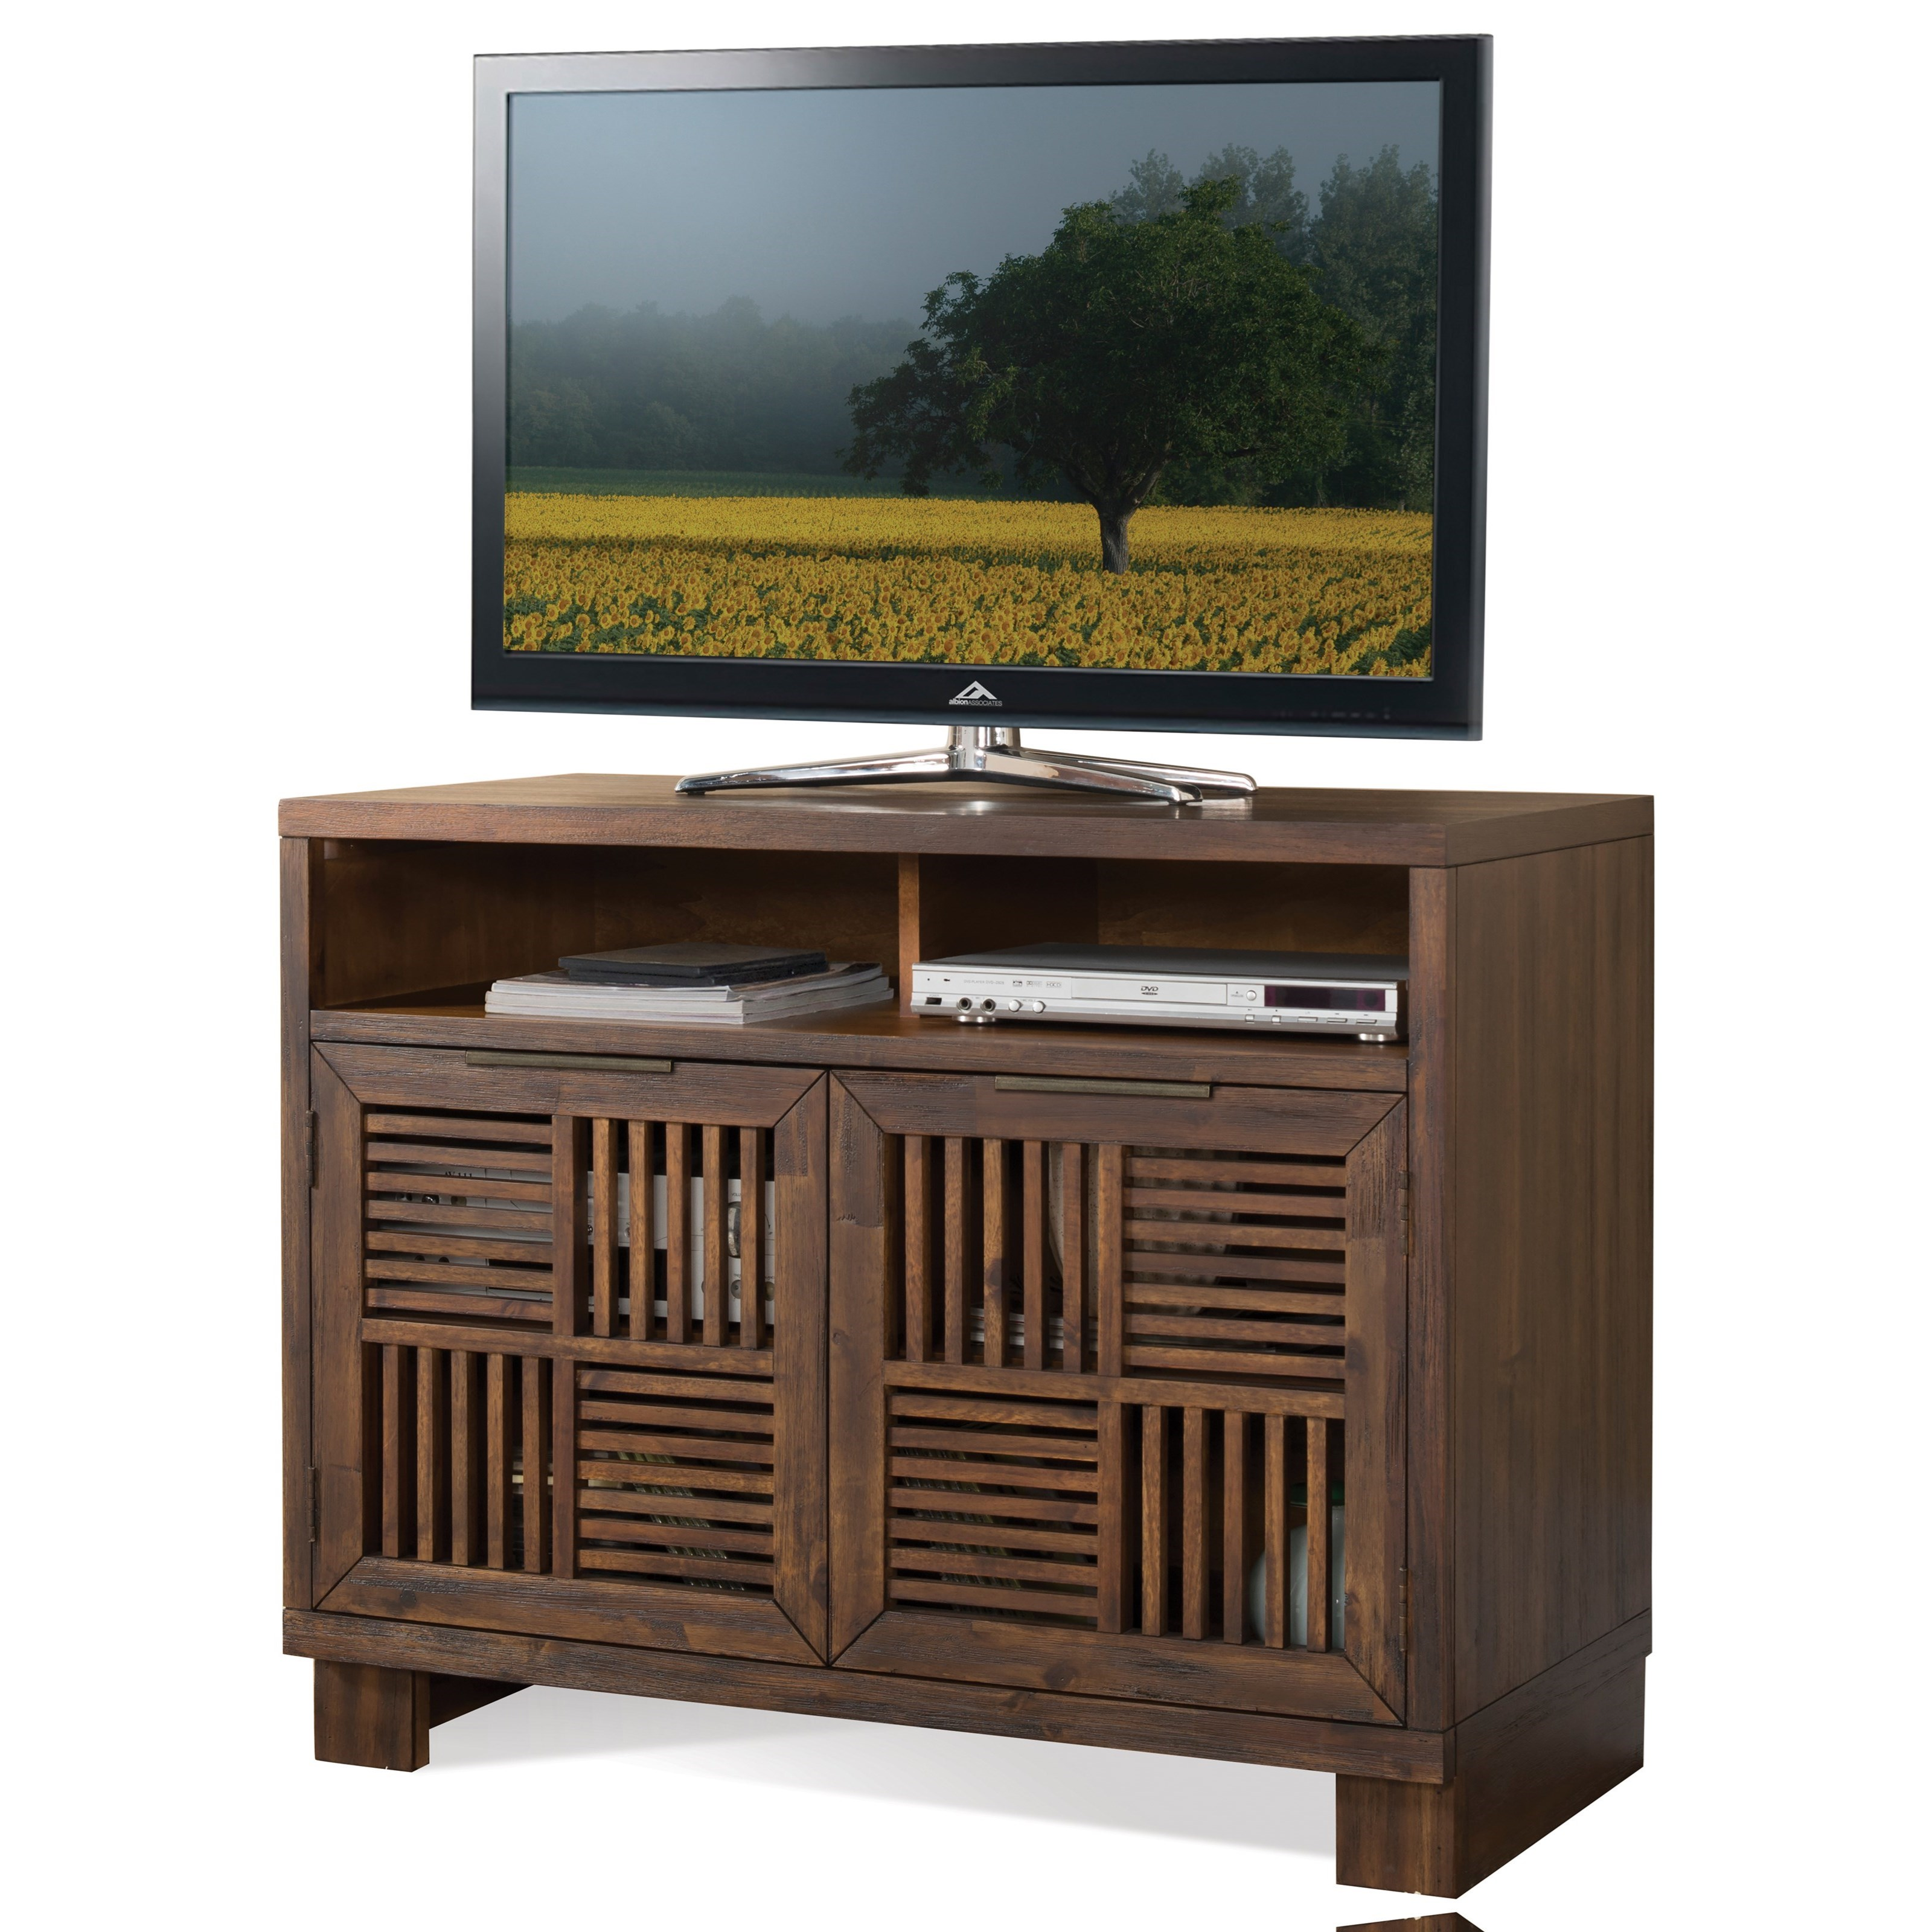 Riverside Furniture Modern Gatherings Media Chest - Item Number: 15364